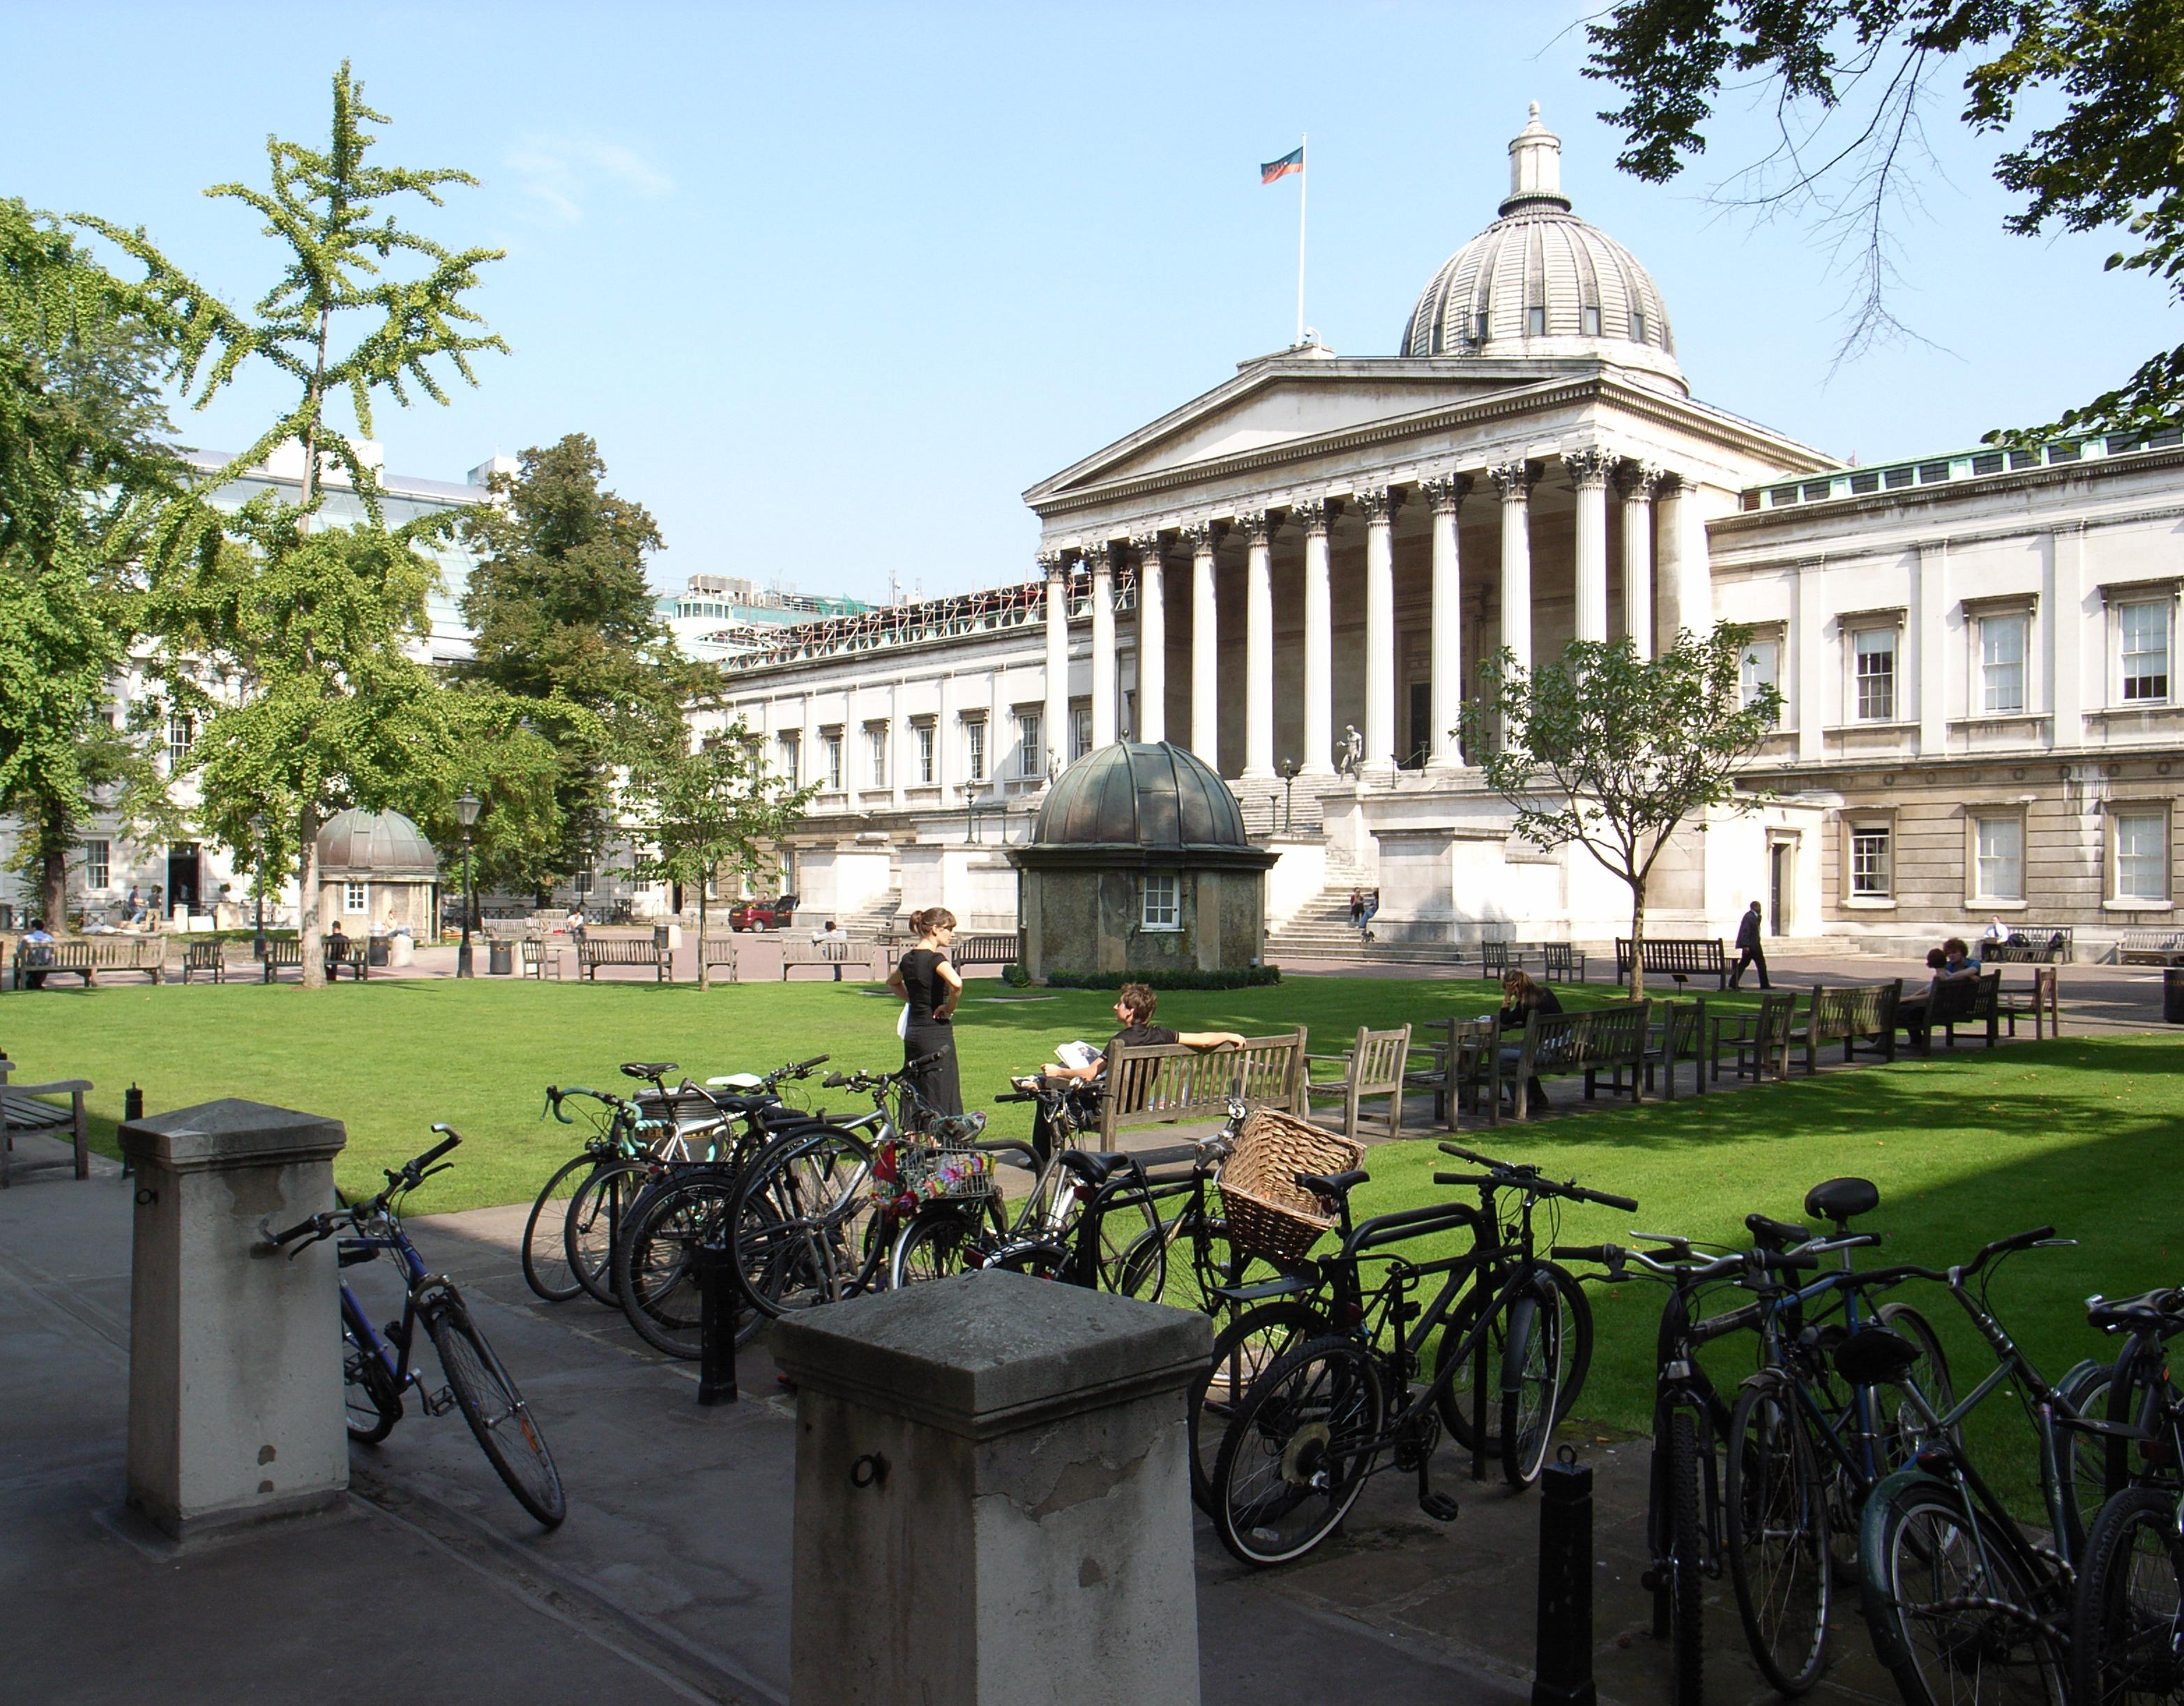 University_College_London_-quadrant-11Sept2006_(1)